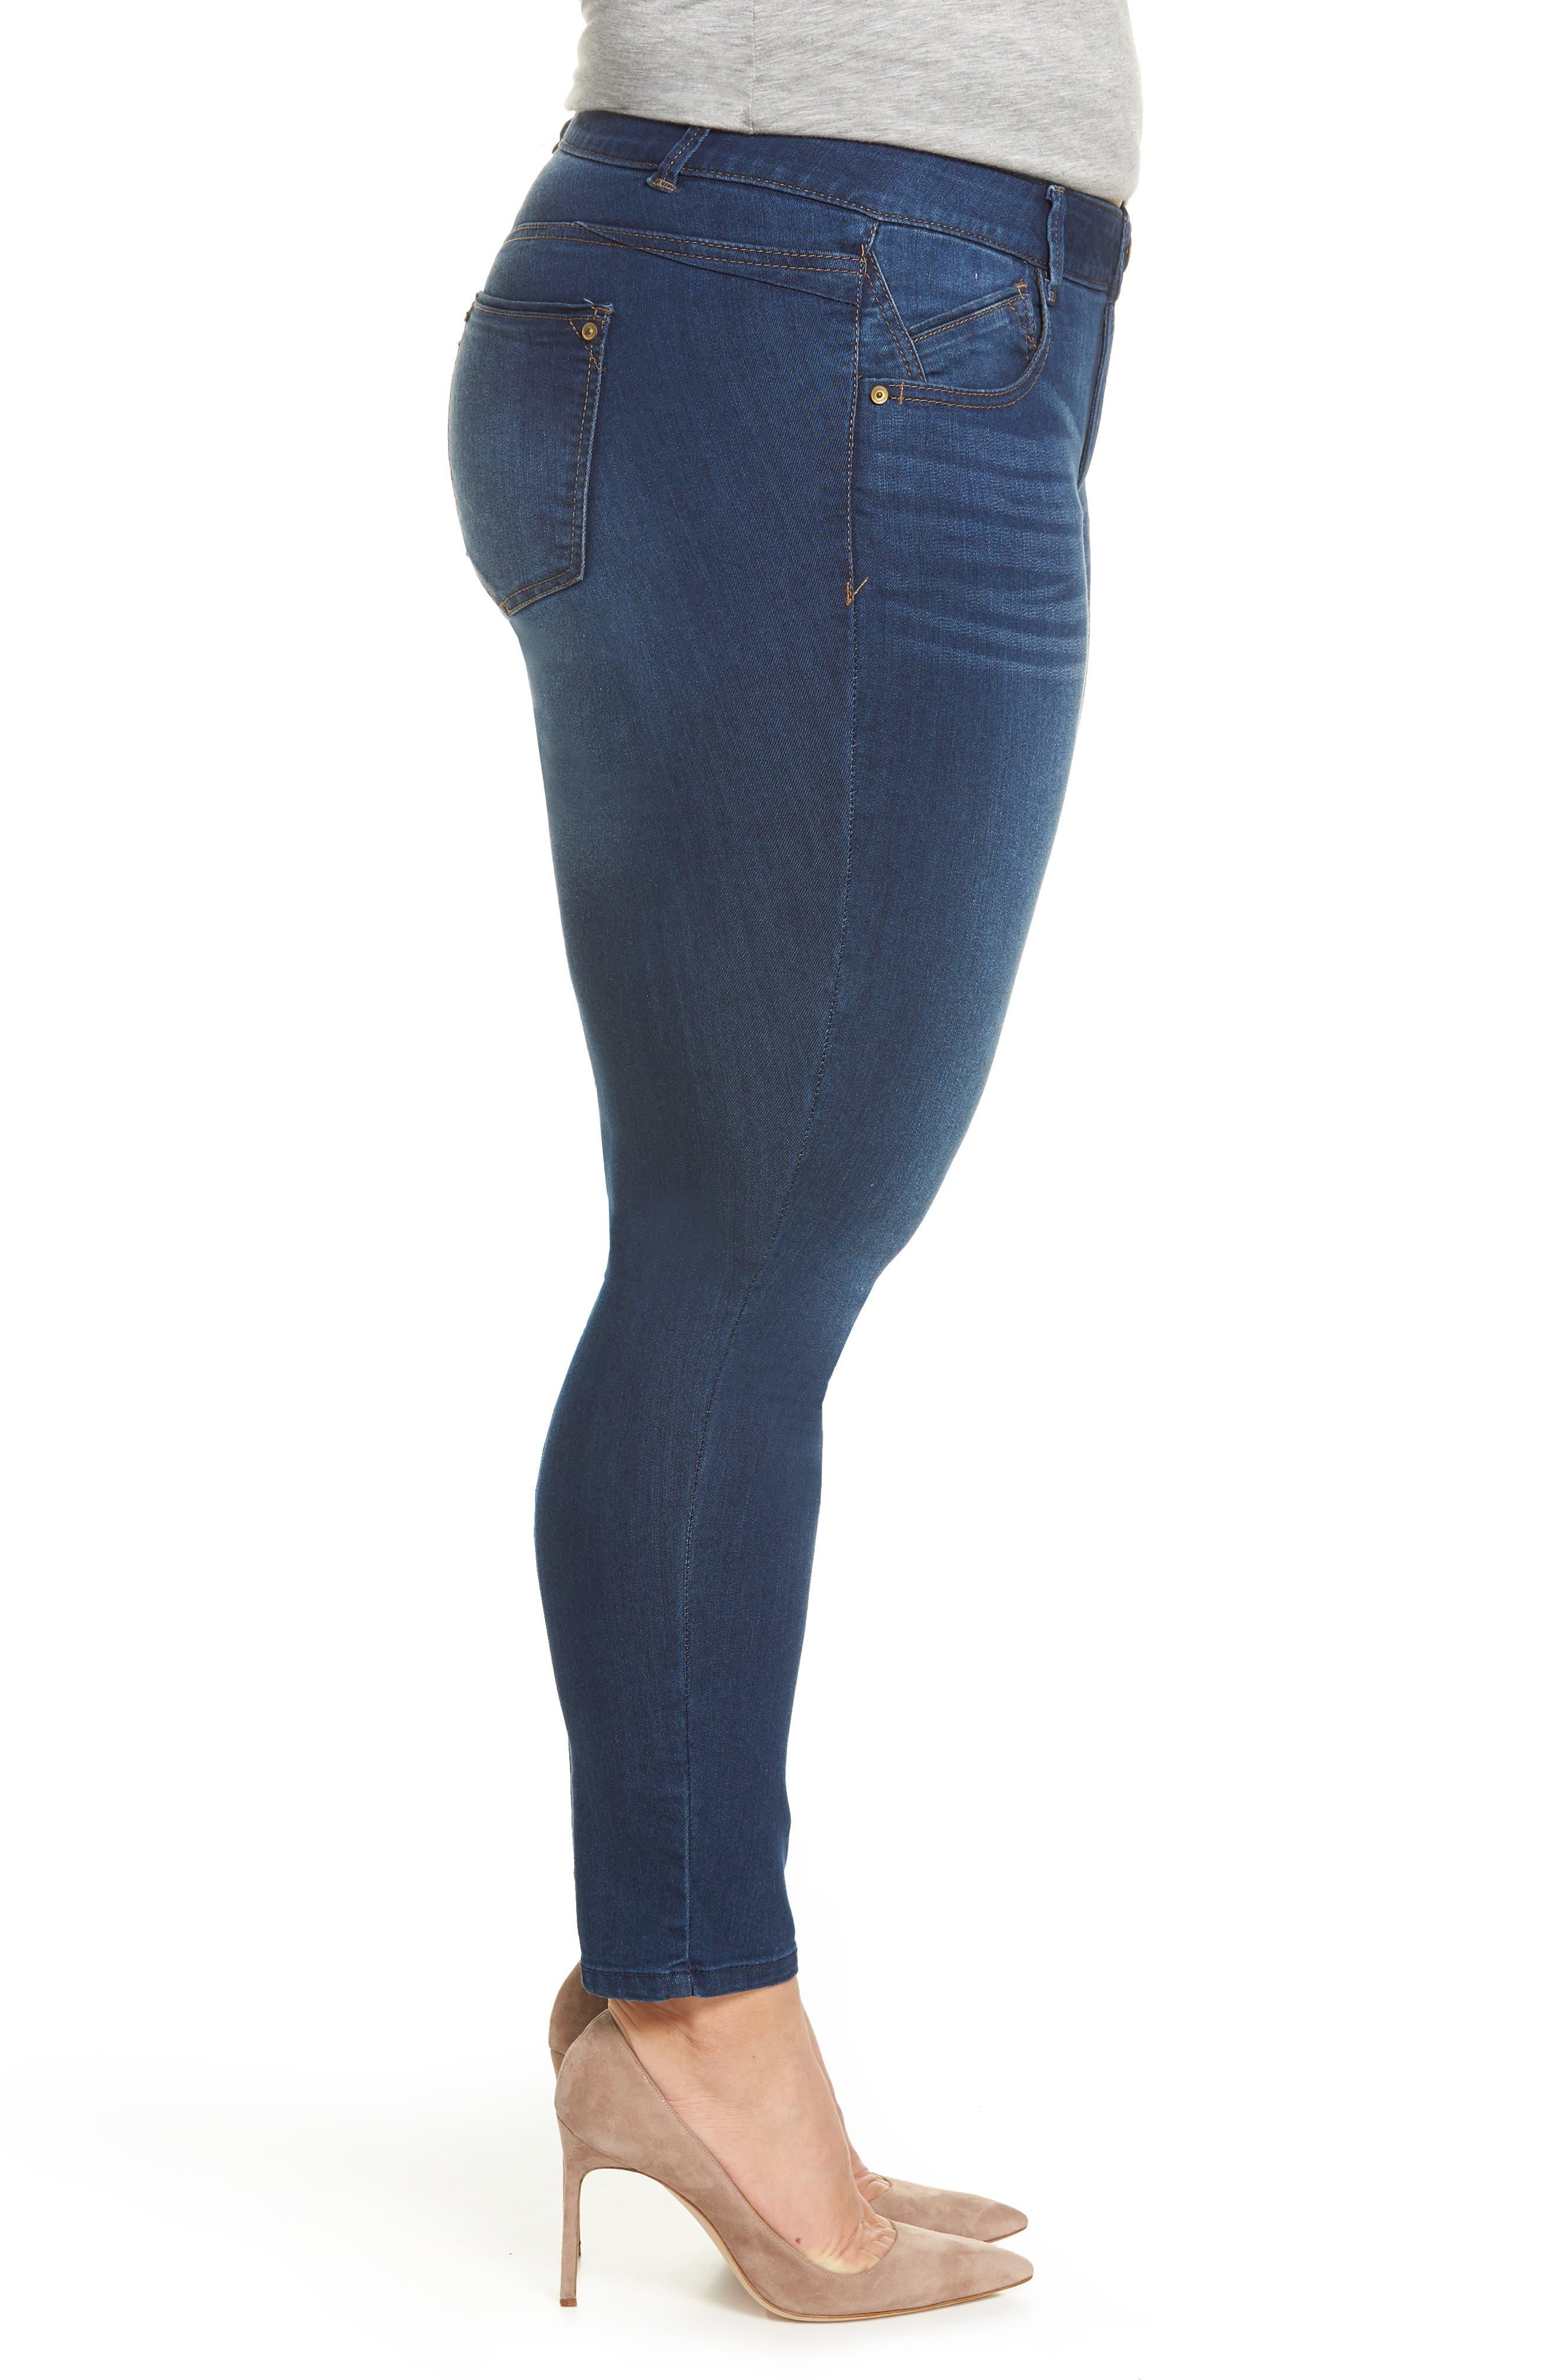 Ab-solution Ankle Skimmer Jeans,                             Alternate thumbnail 3, color,                             Blue